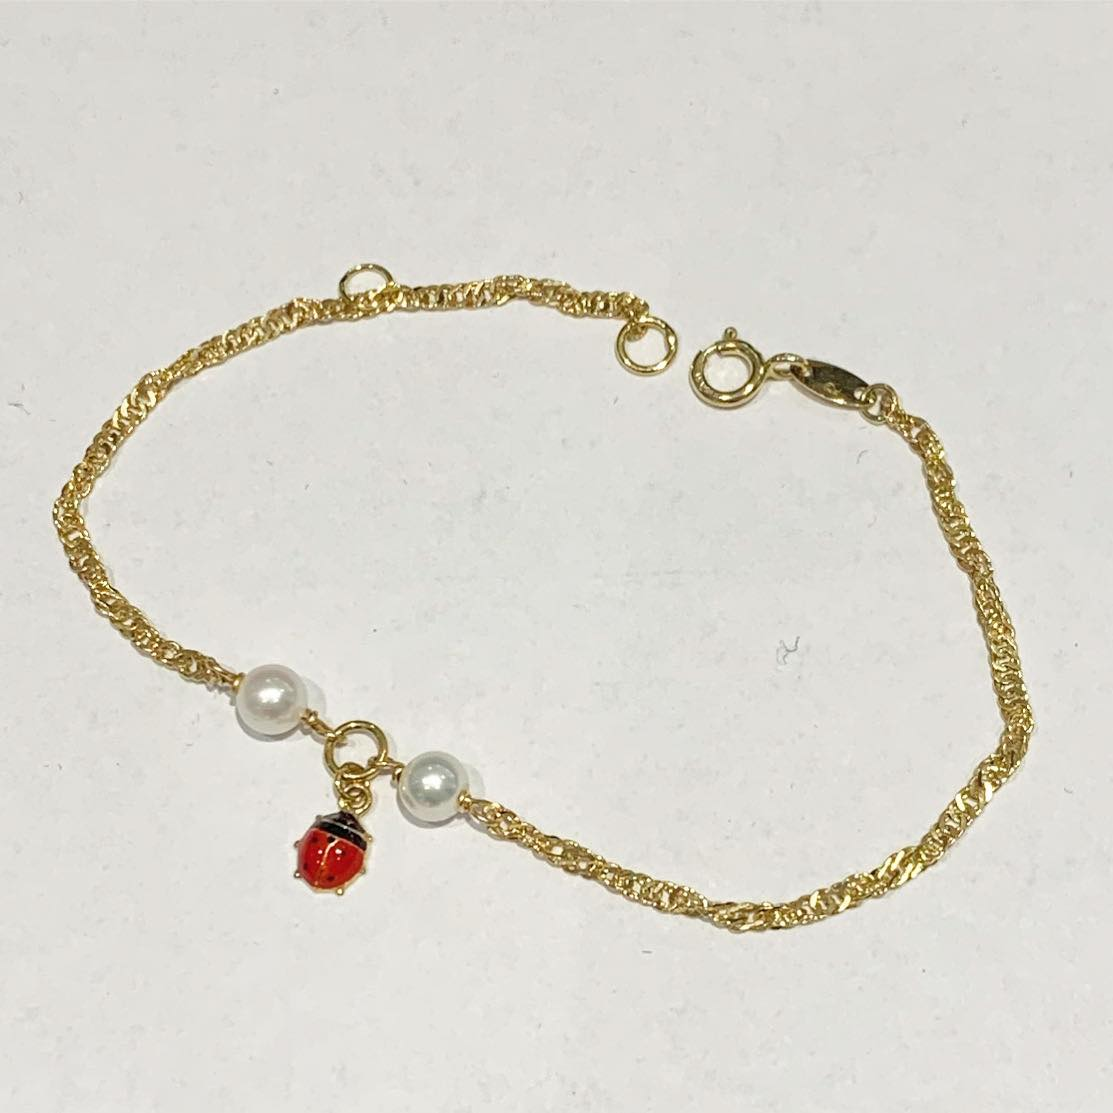 Armlenke gull 14+2cm singapore m/2 perler/marihøne